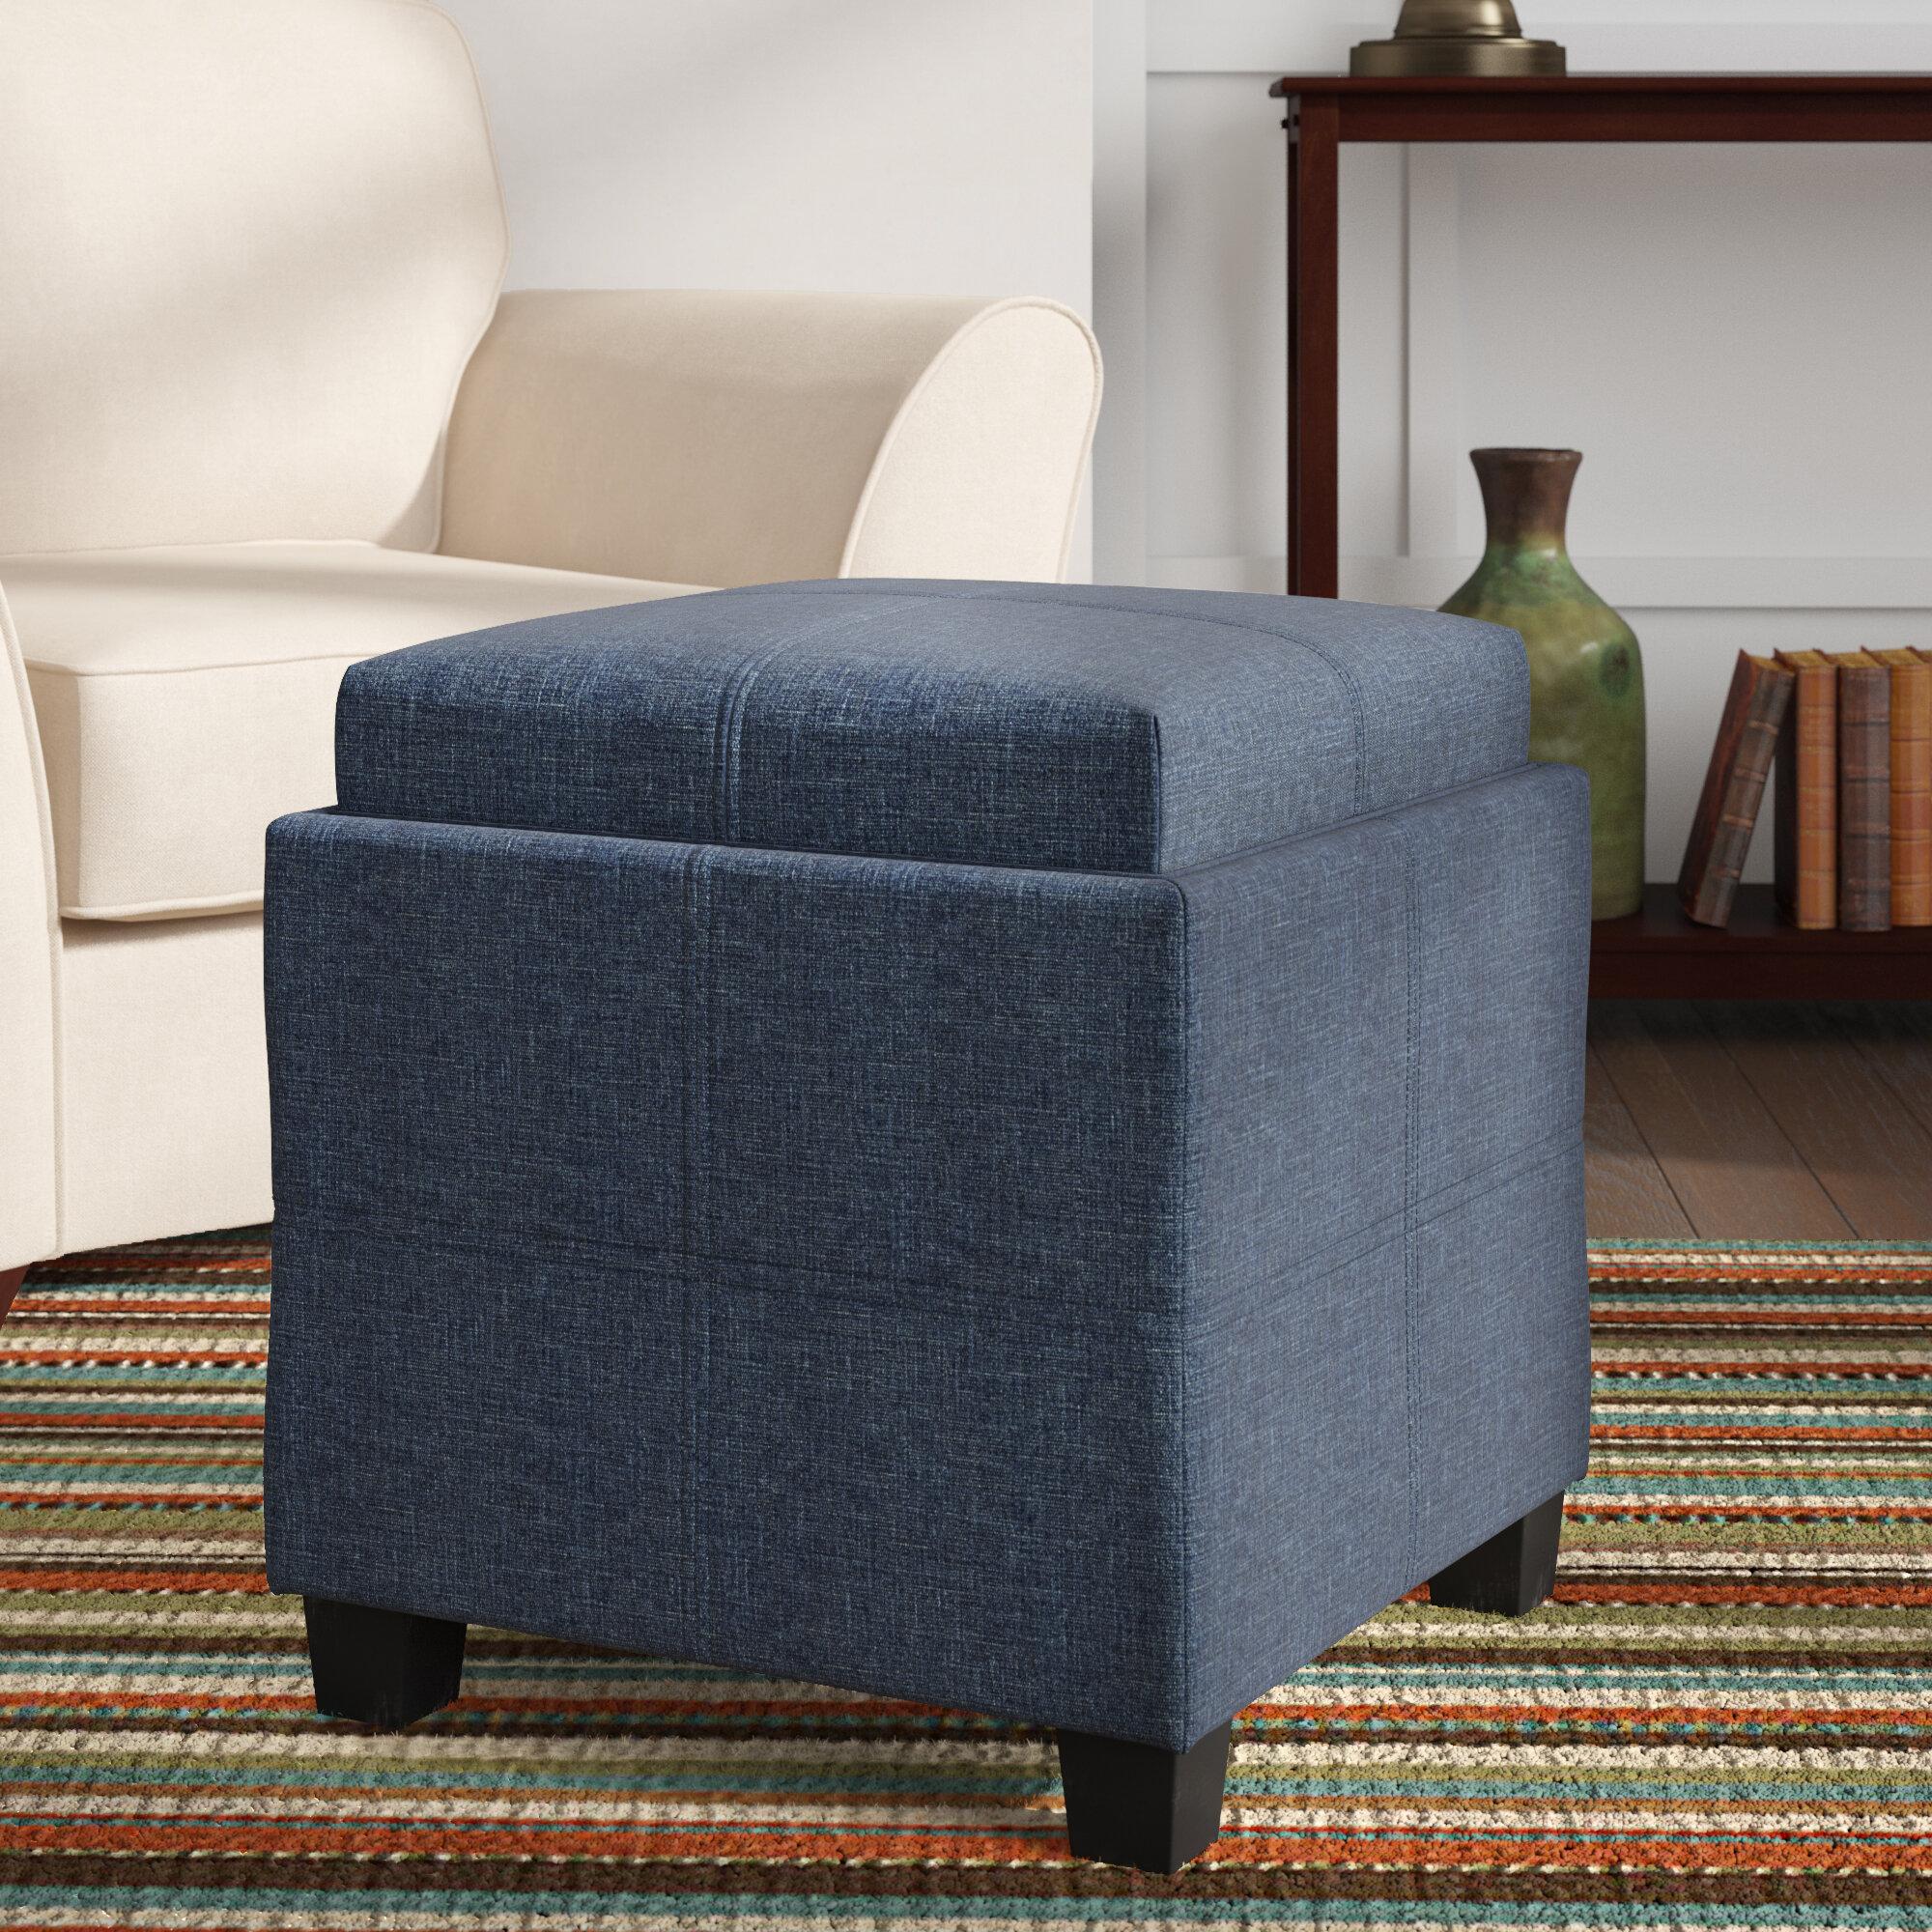 Ebern Designs Pimentel Fabric Storage Cube Reversible Tray Lid